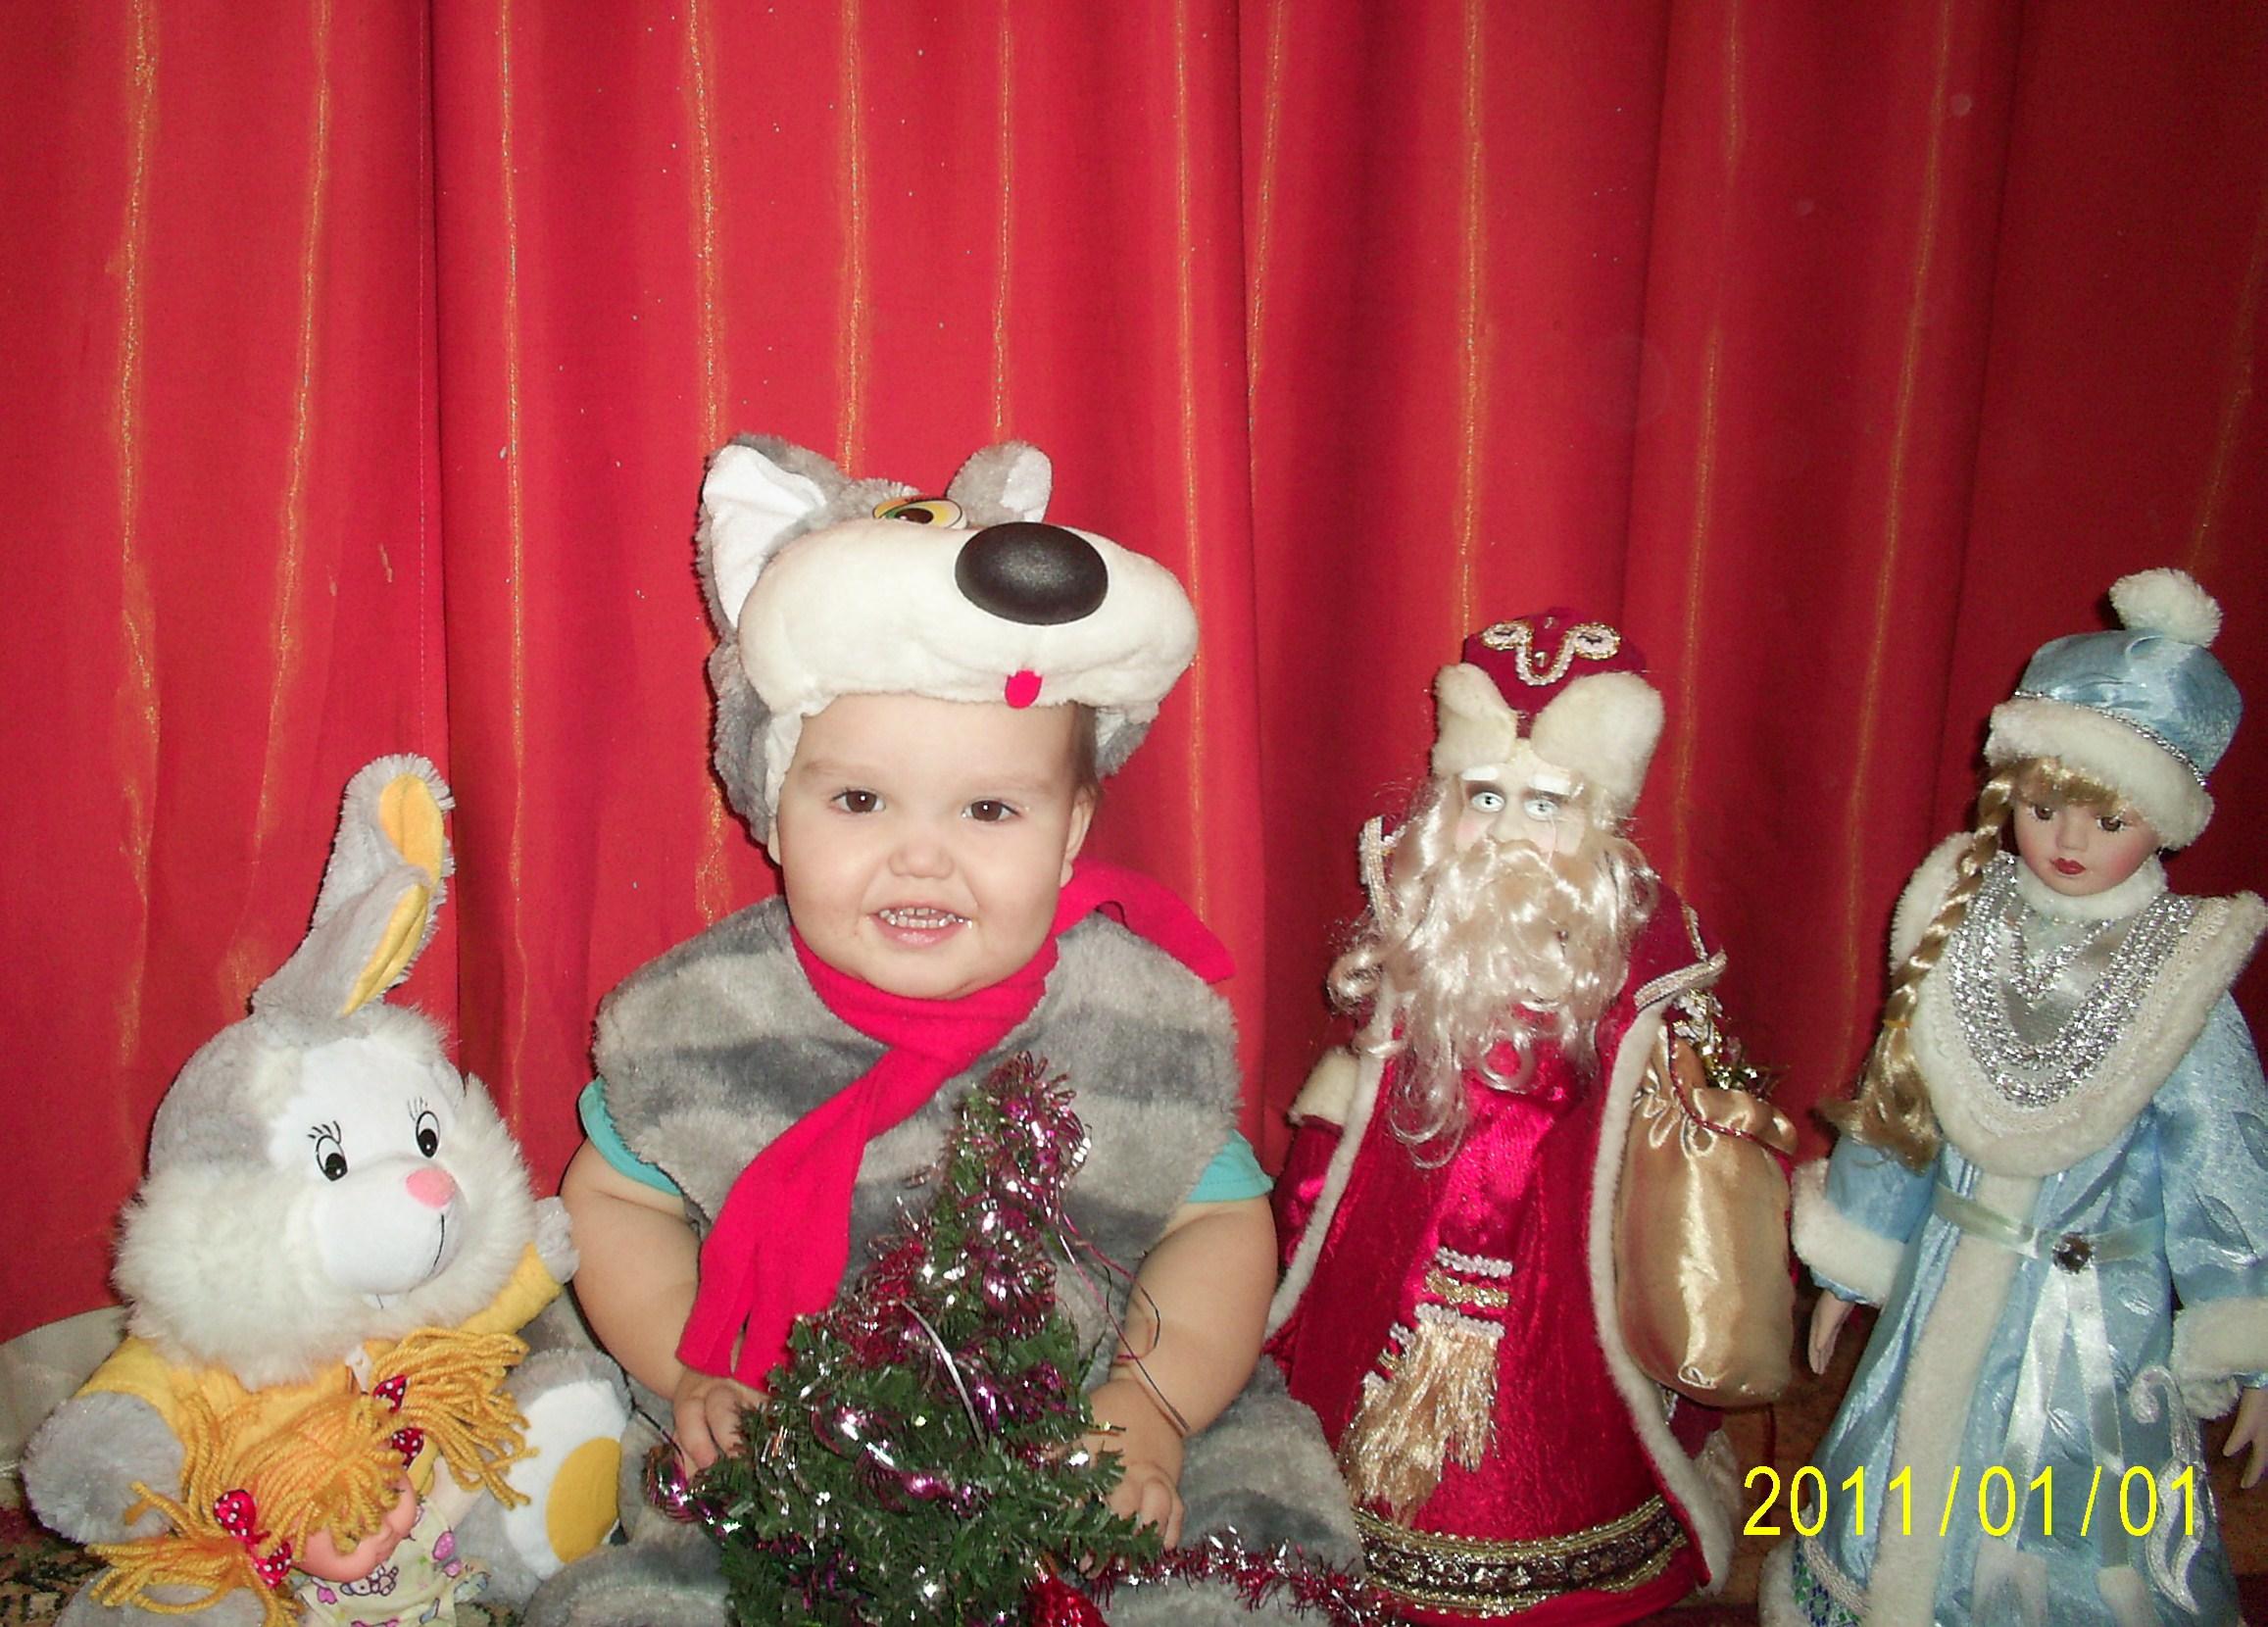 Кот Матроскин!)). Новогодний карнавал